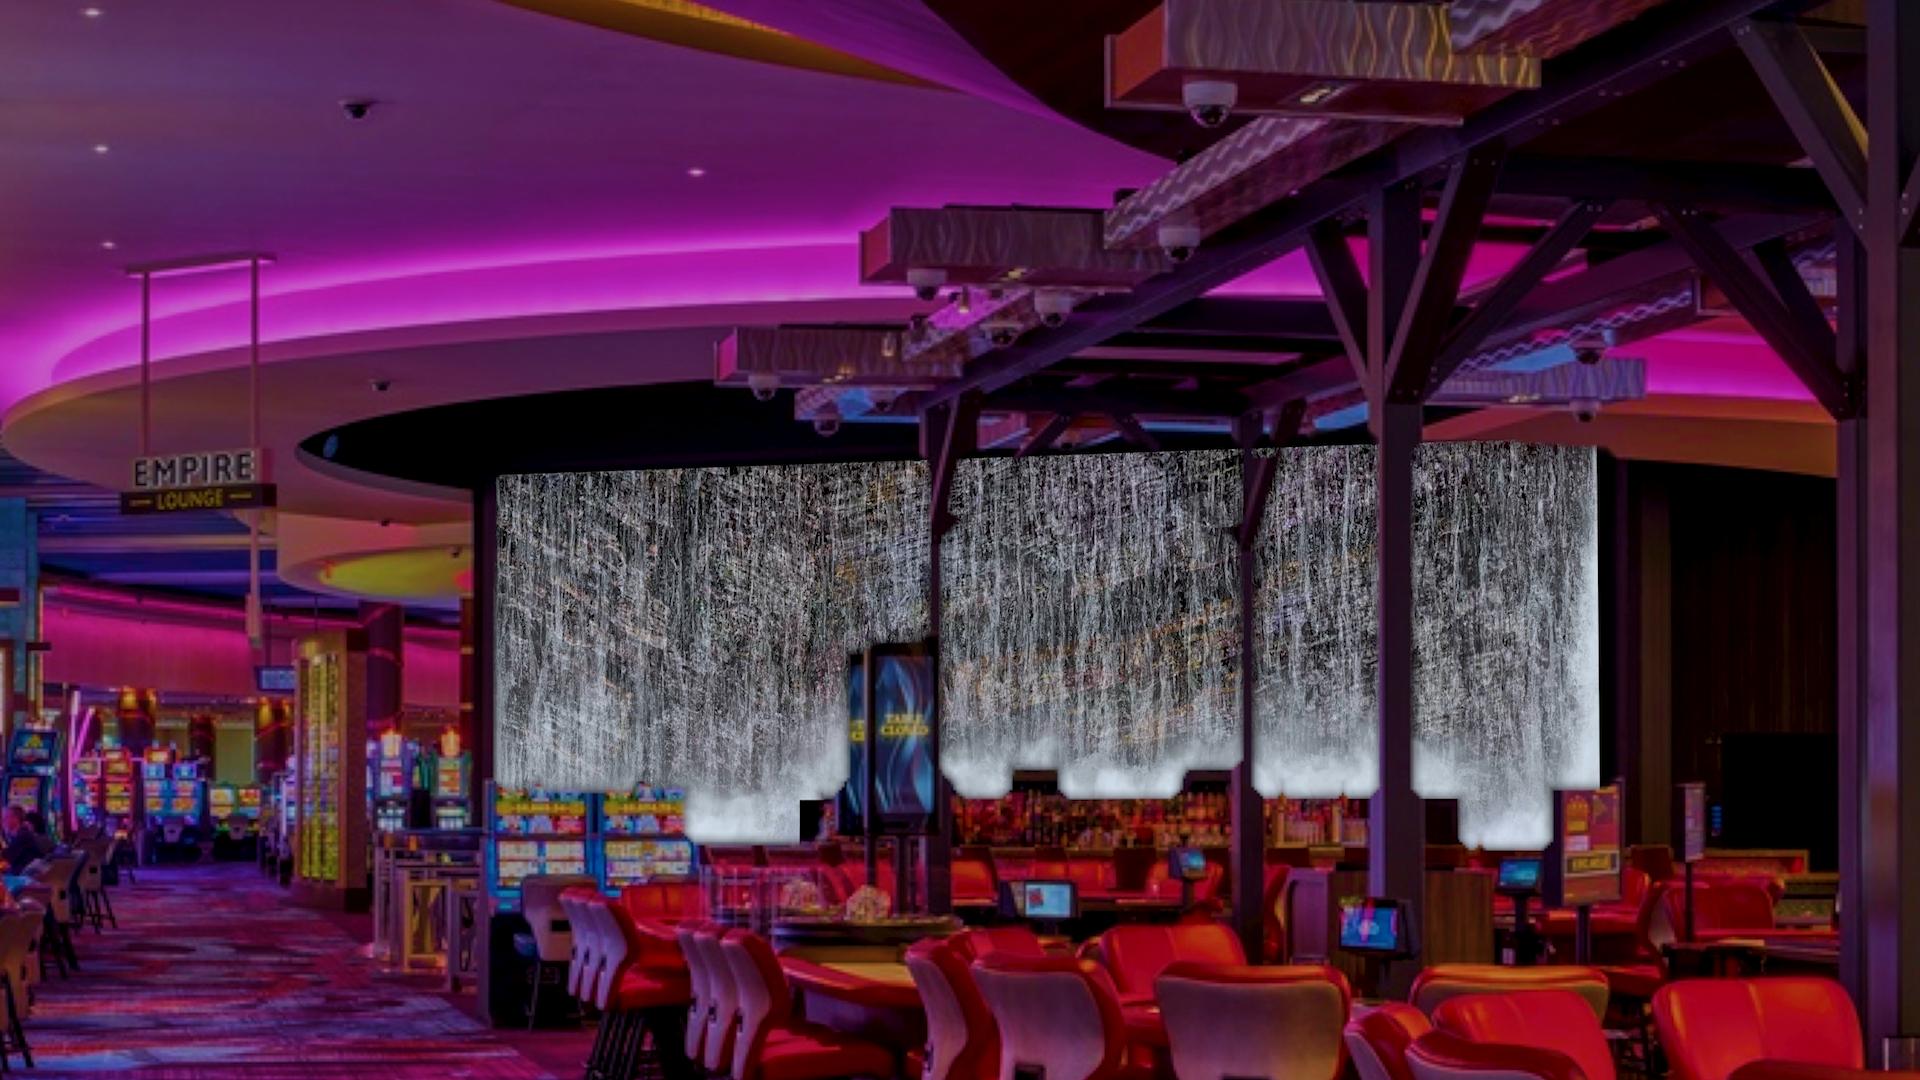 Empire Lounge, Resorts World Catskills